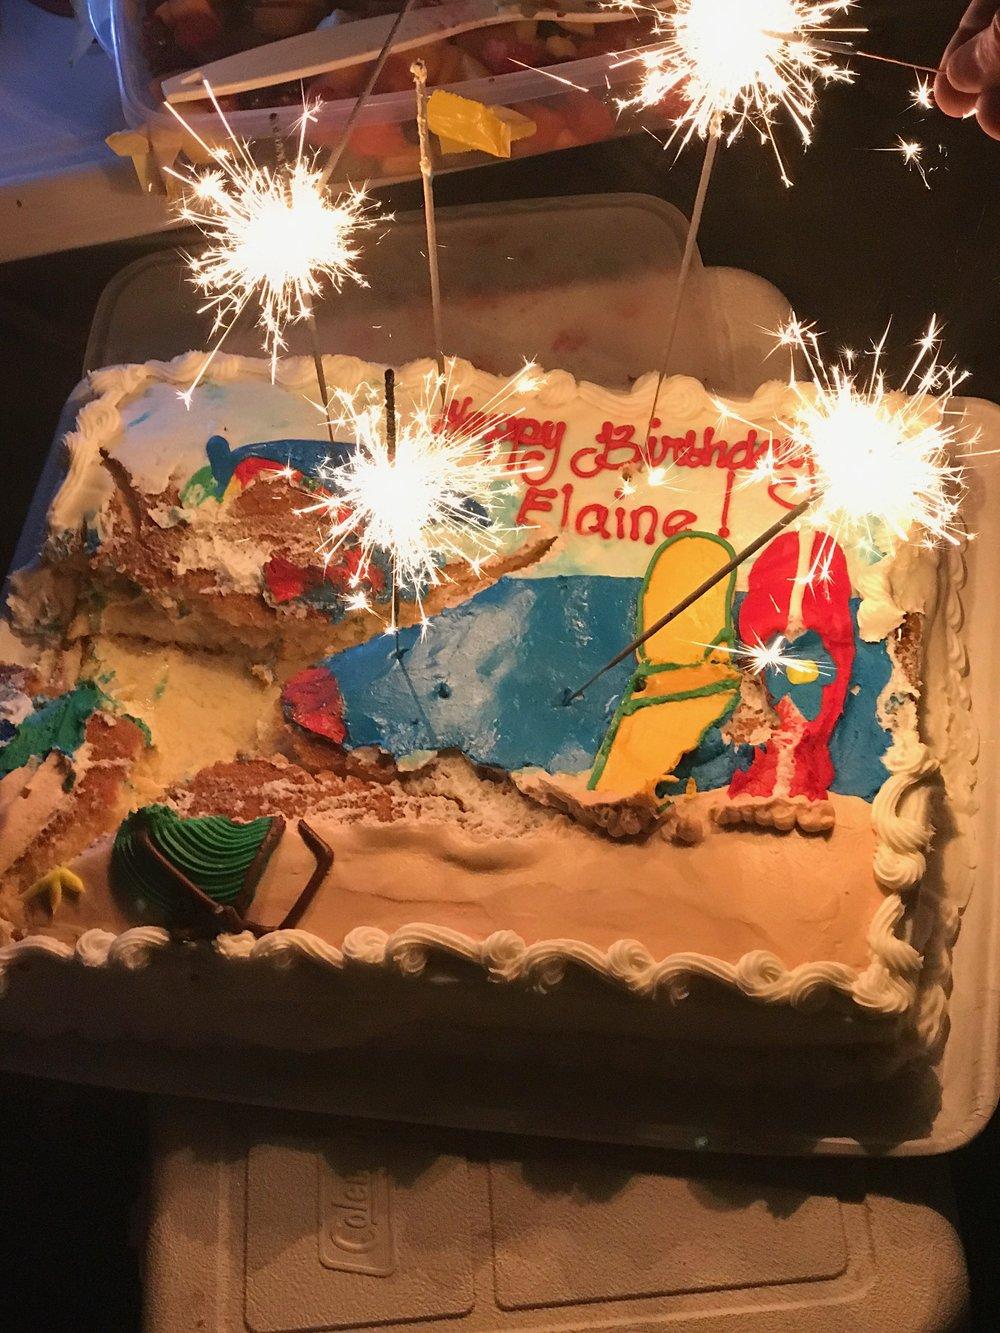 Birthday cake w sparklers IMG_2210.jpg*.jpg